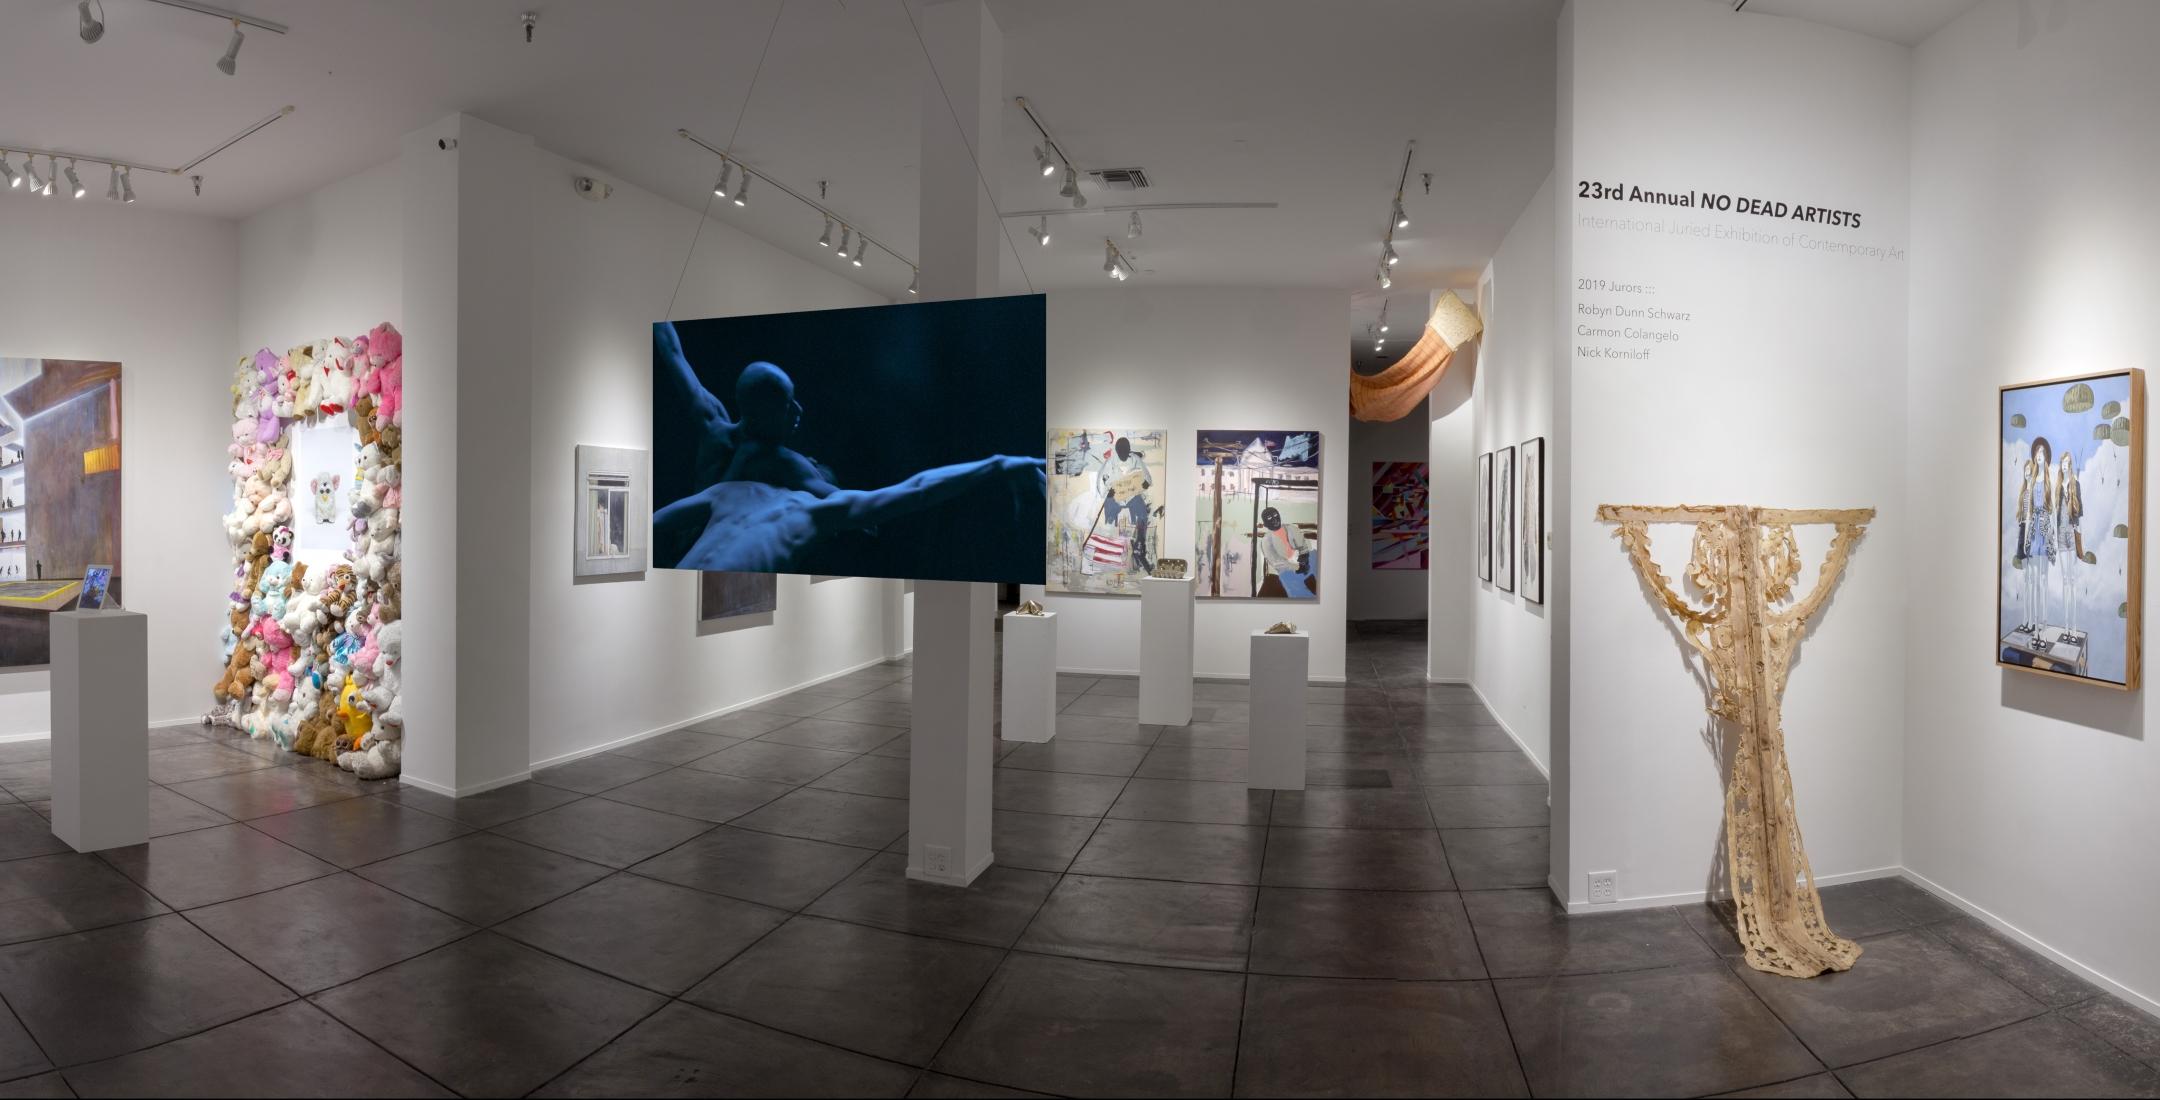 23RD ANNUAL NO DEAD ARTISTS - Exhibitions - JONATHAN FERRARA